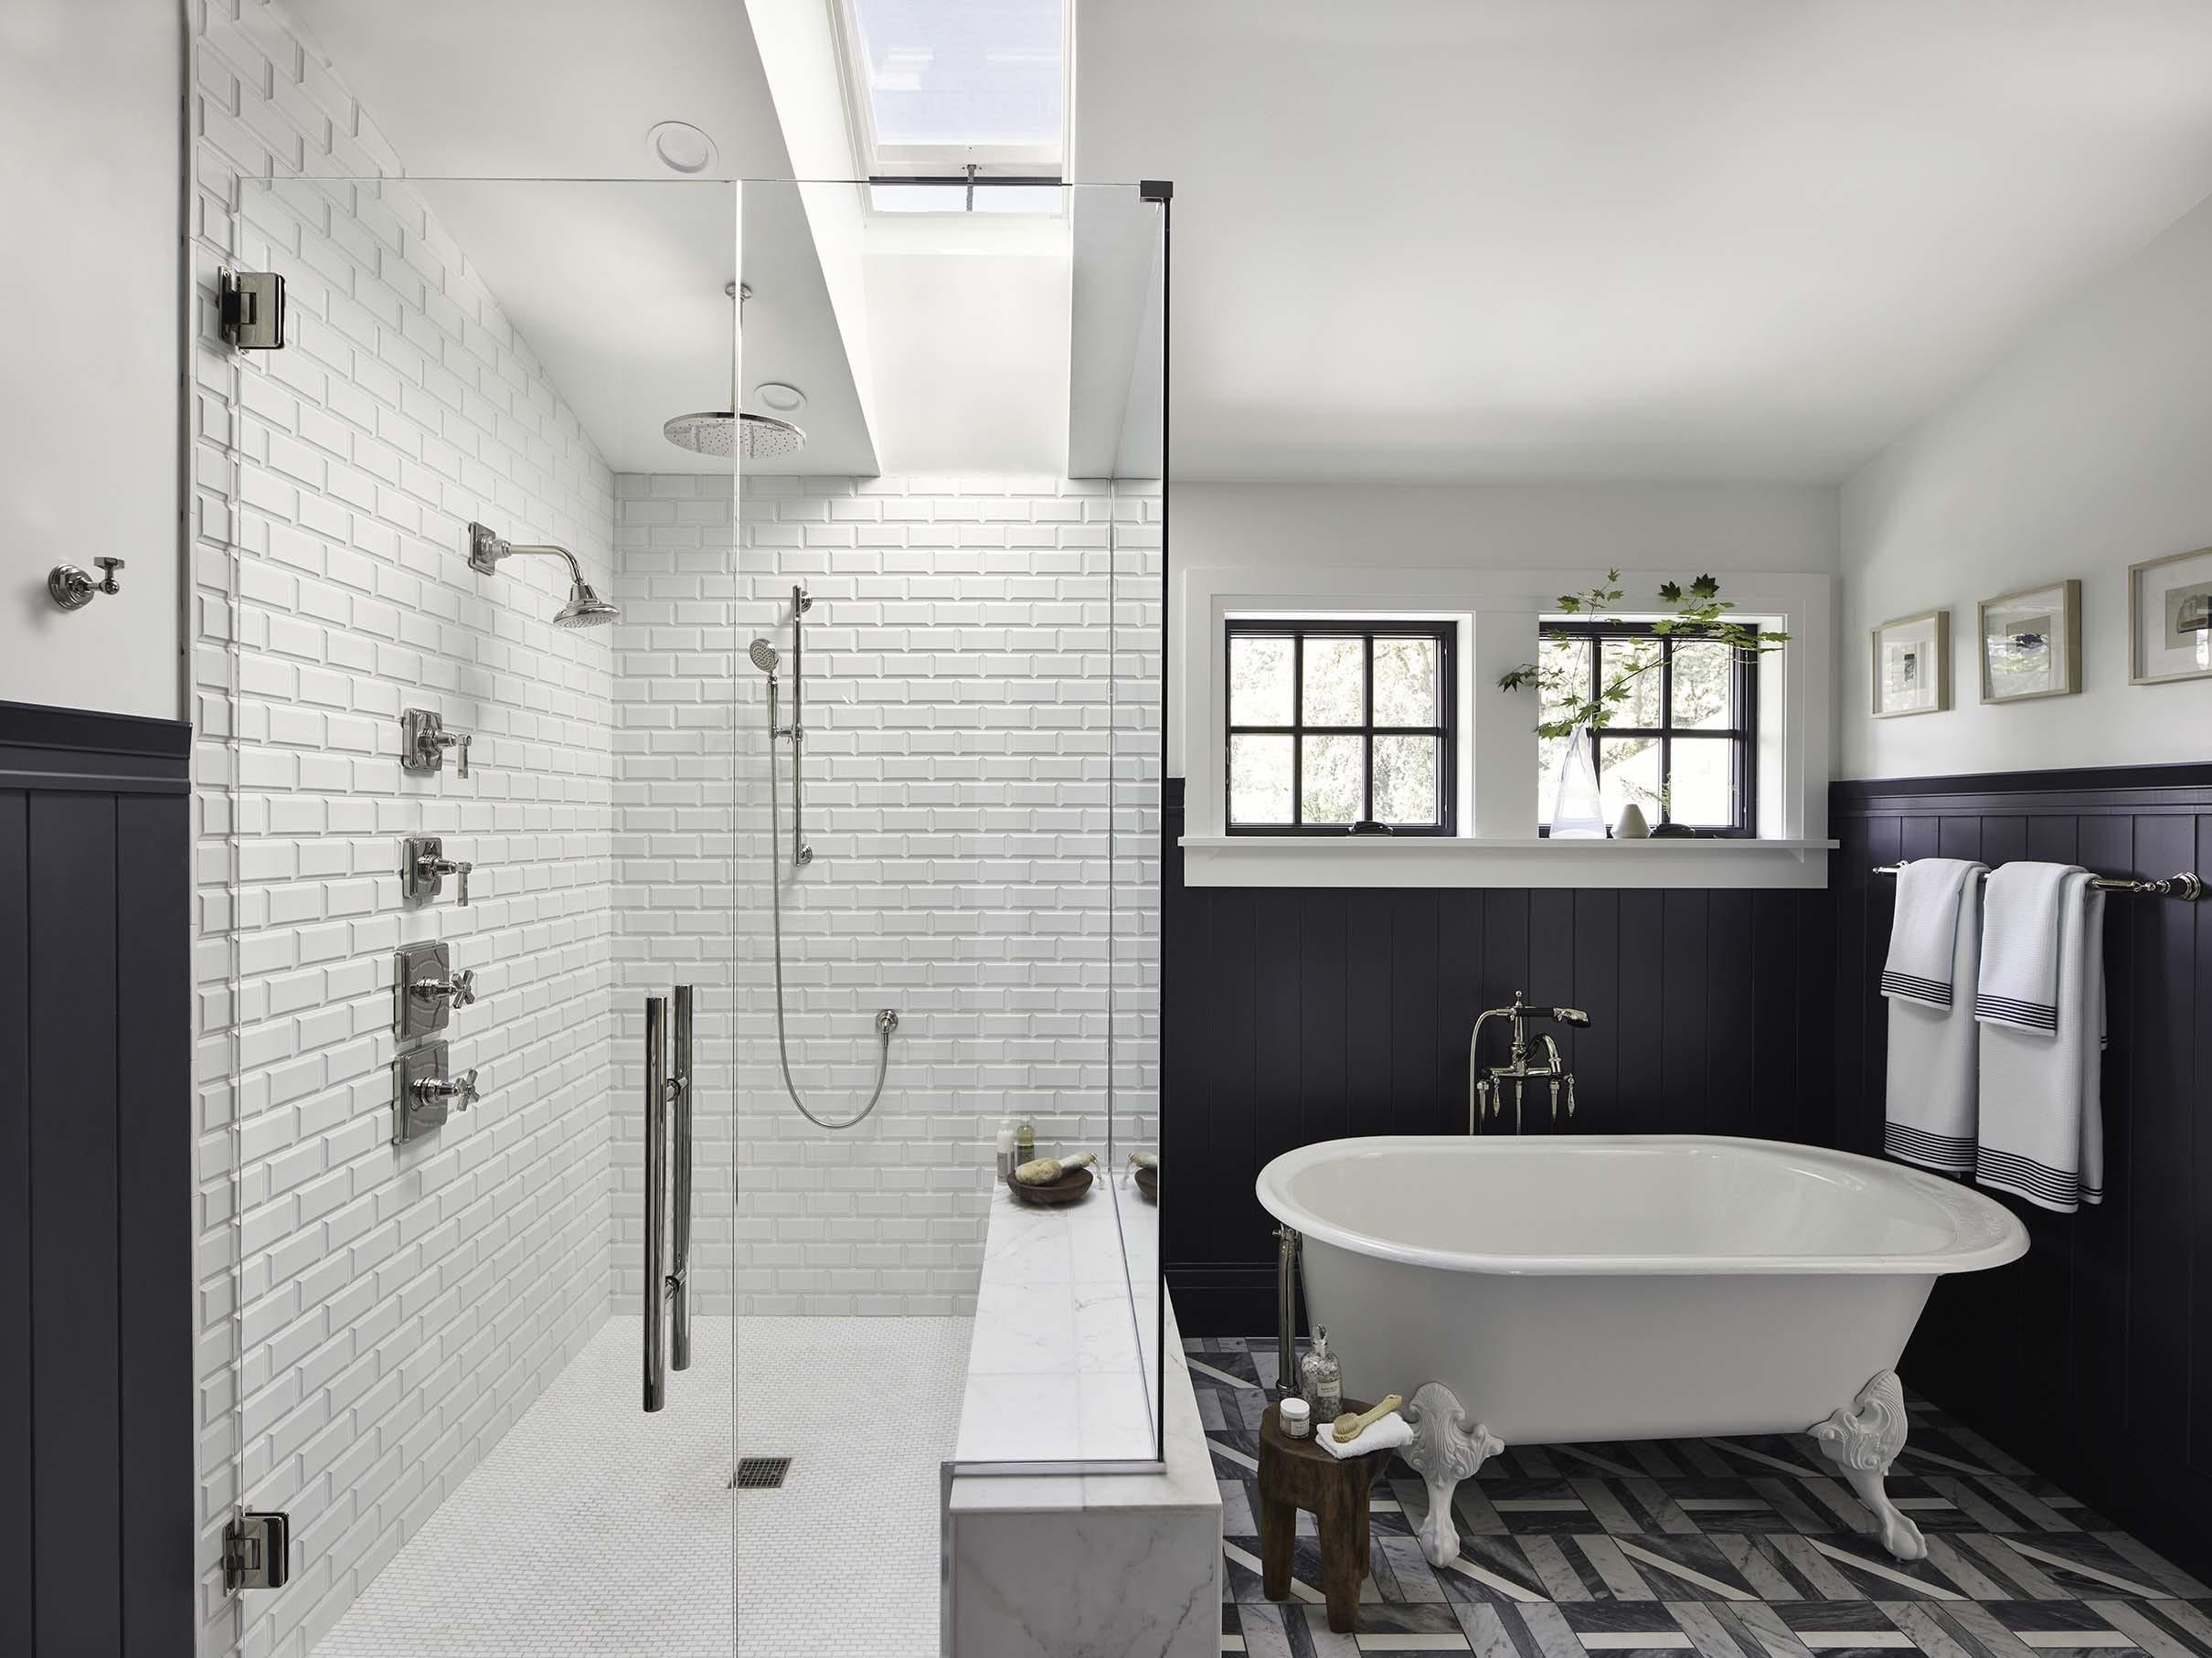 Bathroom shower skylight blue white tub